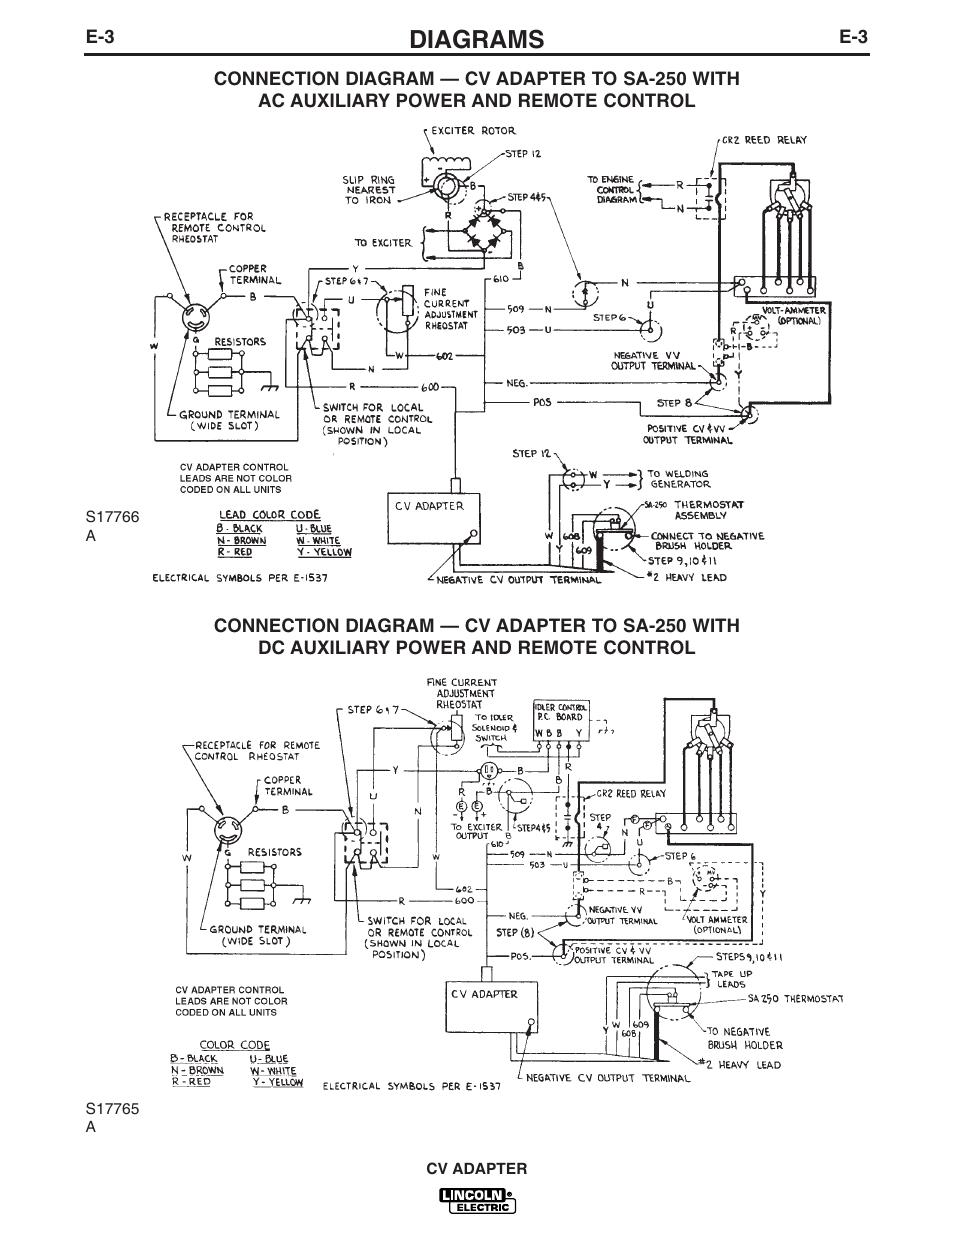 Lincoln Sa 250 Remote Wiring Diagram Modern Design Of 32rh Diagrams Electric Cv Adapter Im309 D User Manual Page 32 Rh Manualsdir Com 2001